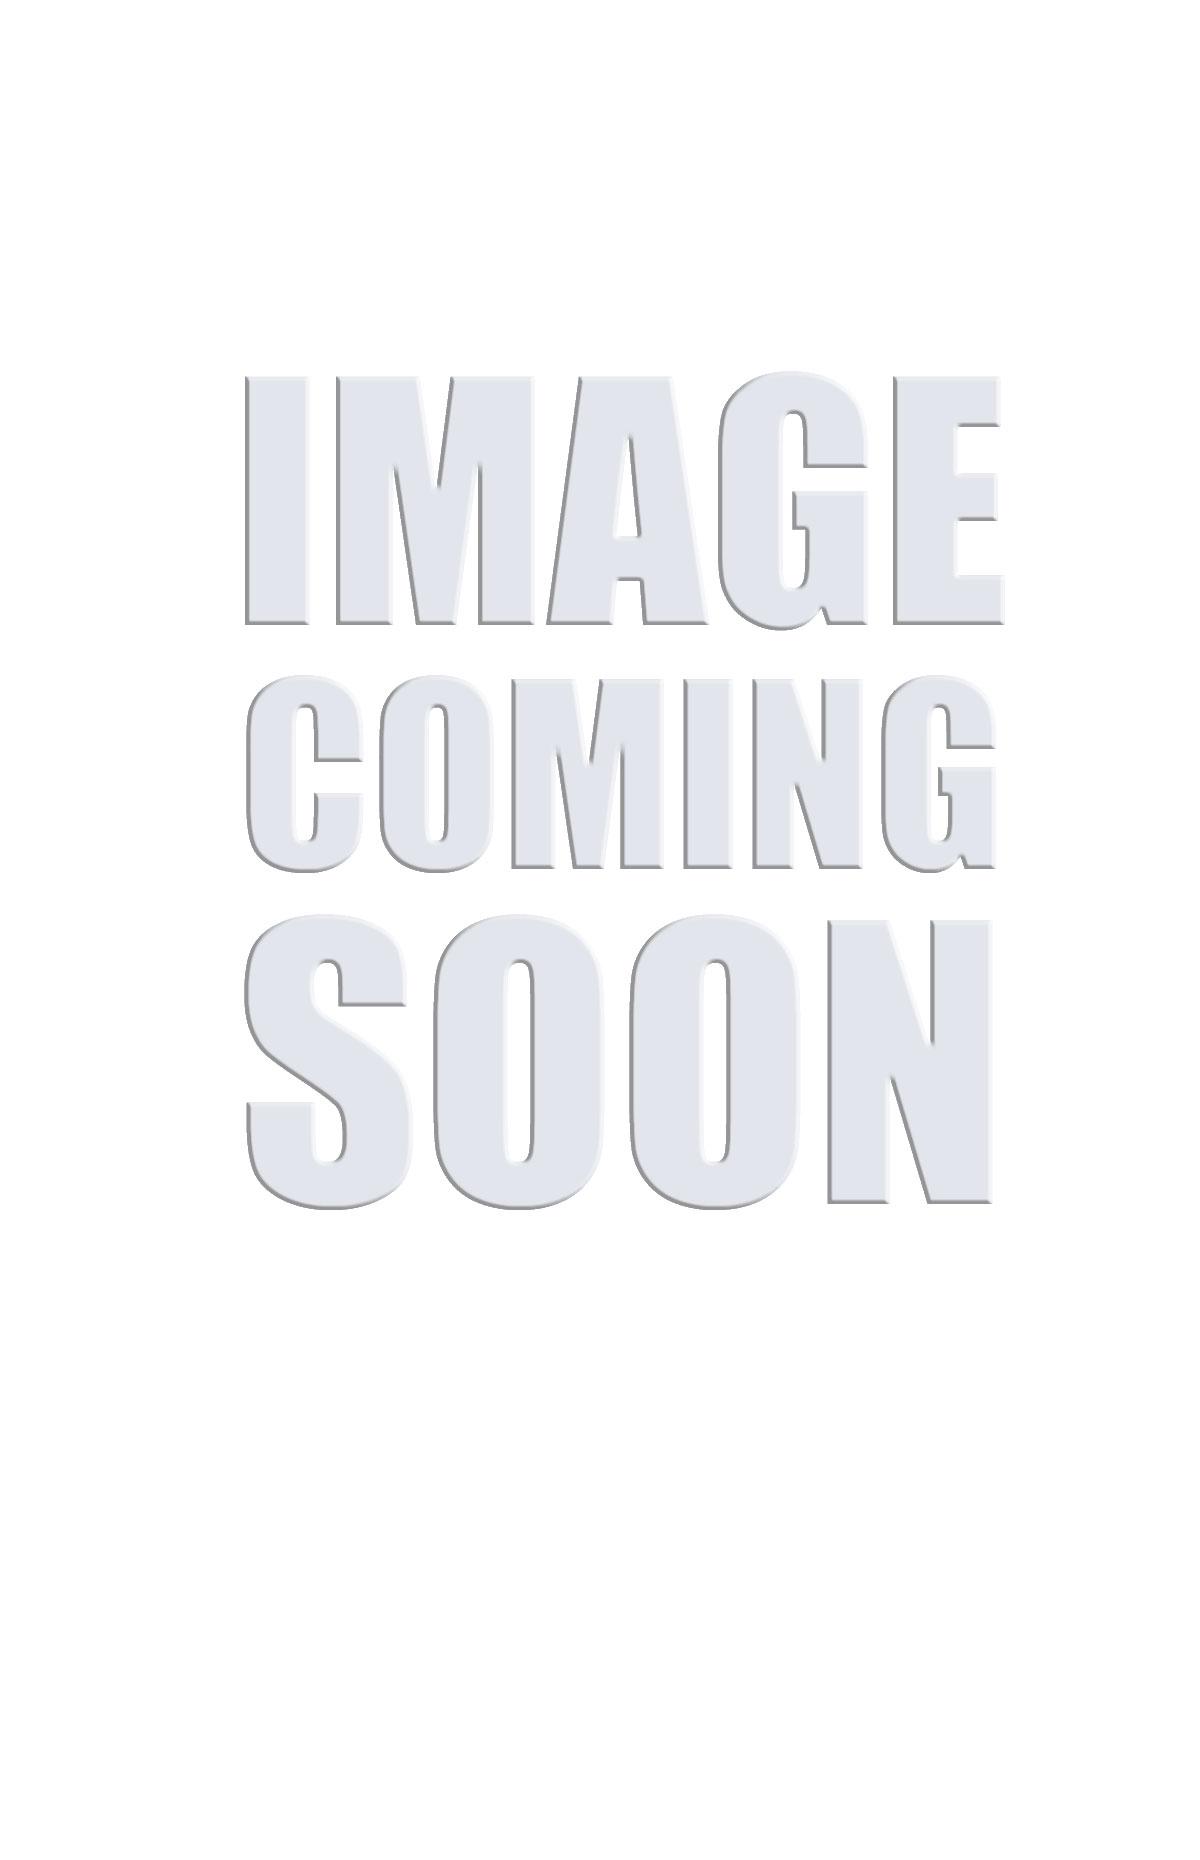 Peripheral Discharge Vacuum Motor - Lamb #119414-00, BPP, B/B, AS, E, G2K, 2 STG